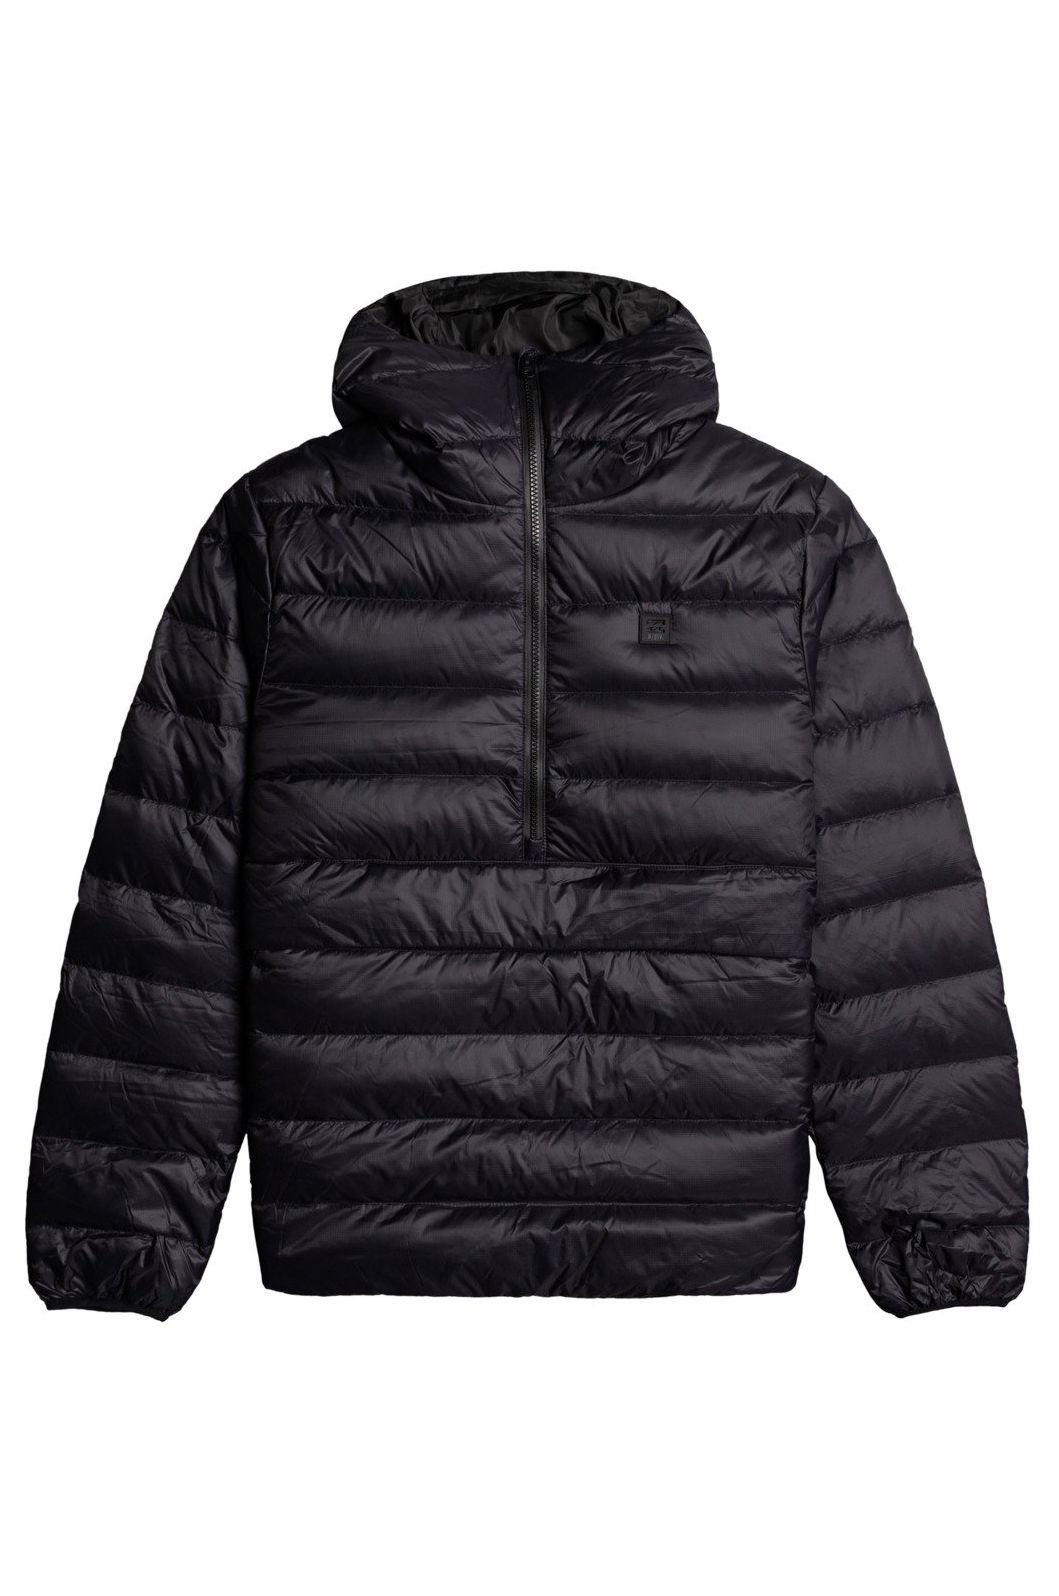 Billabong Jacket BROADPEAK PO ADVENTURE DIVISION Black